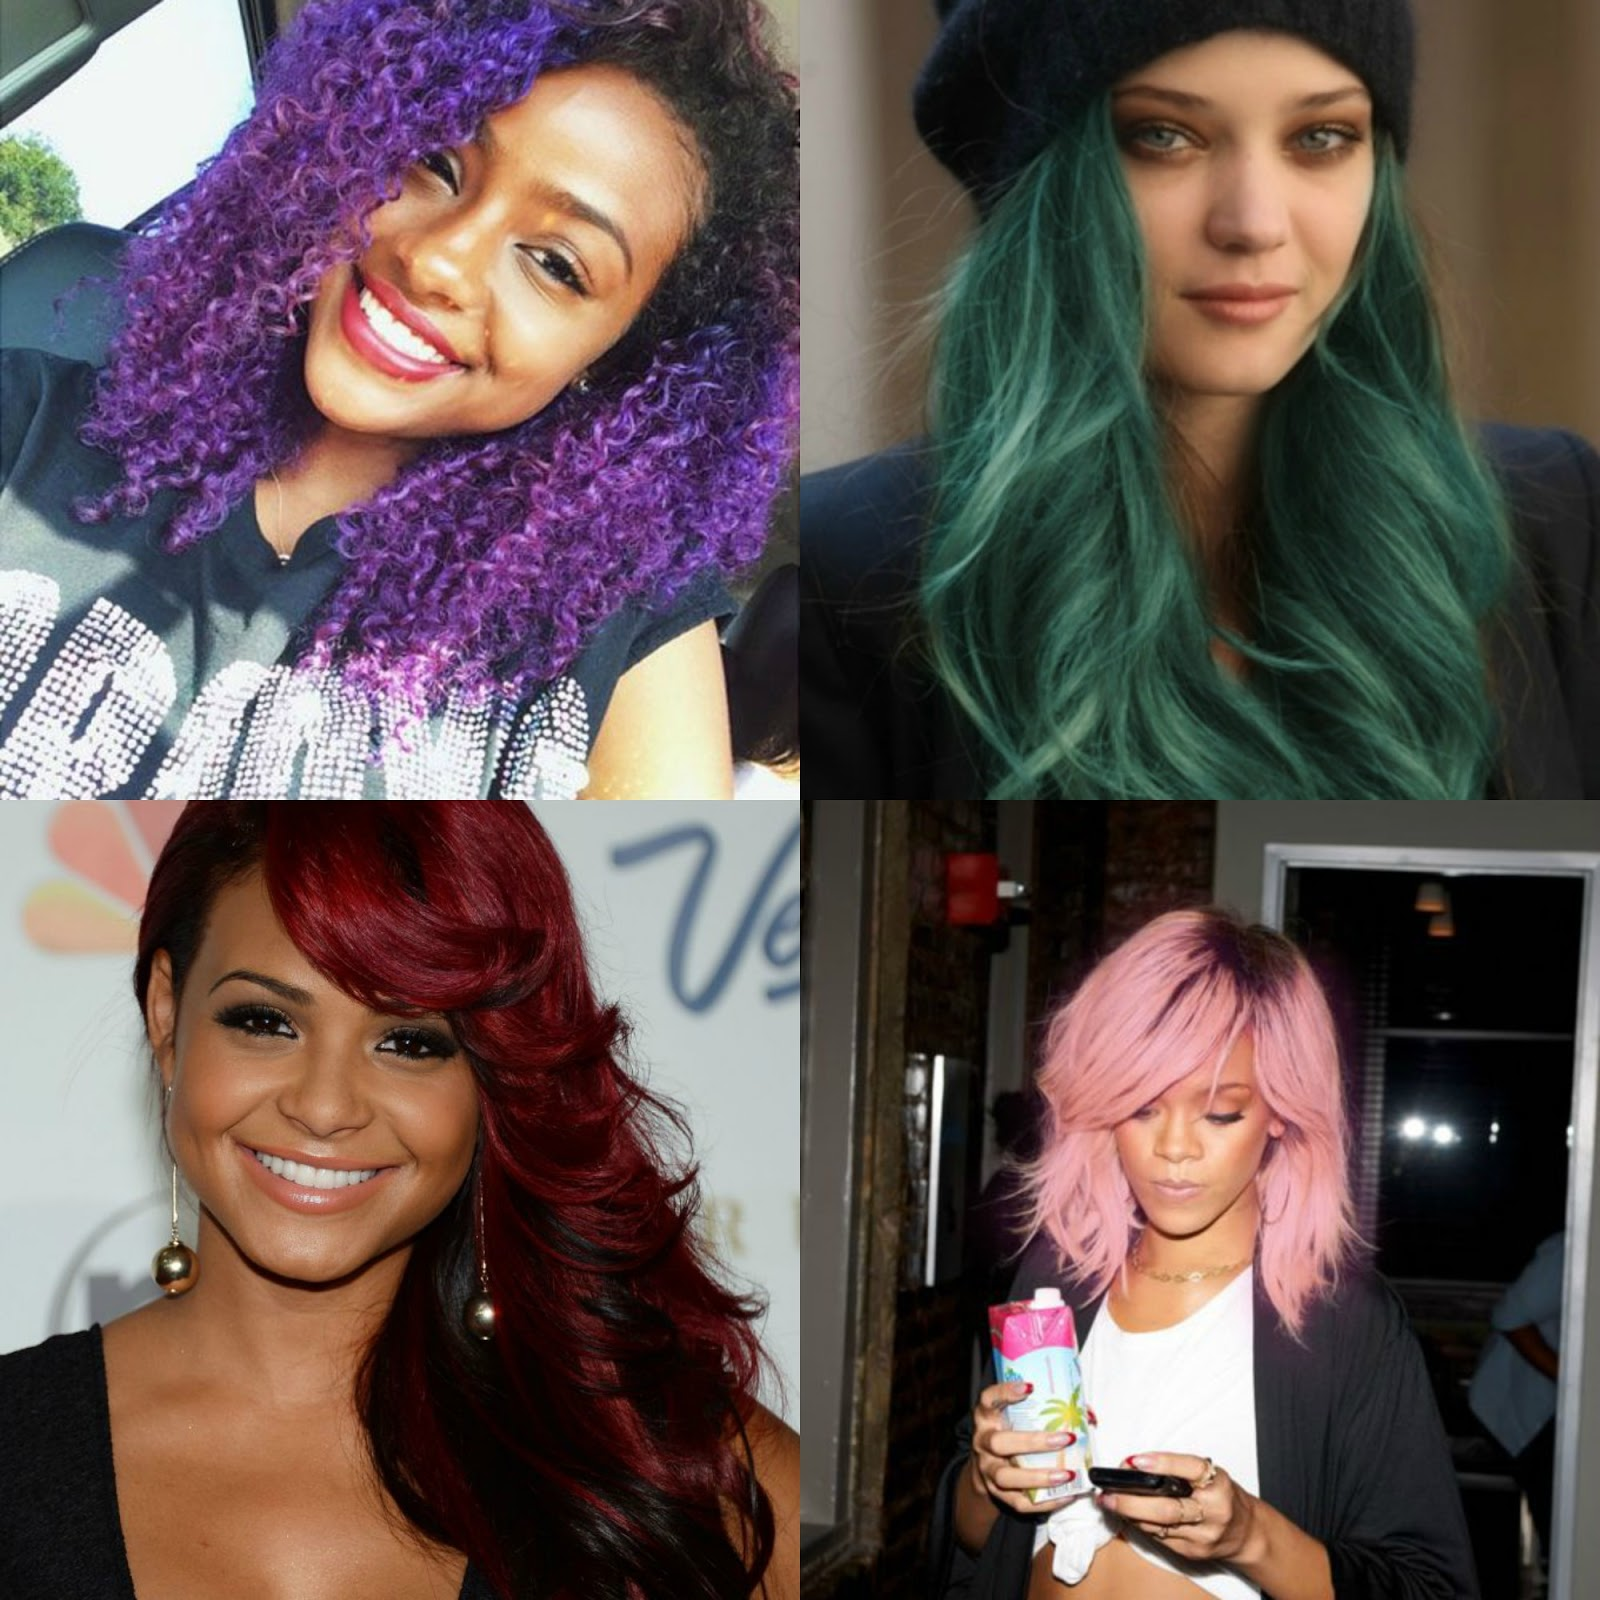 Colores de cabello fantasia para piel morena